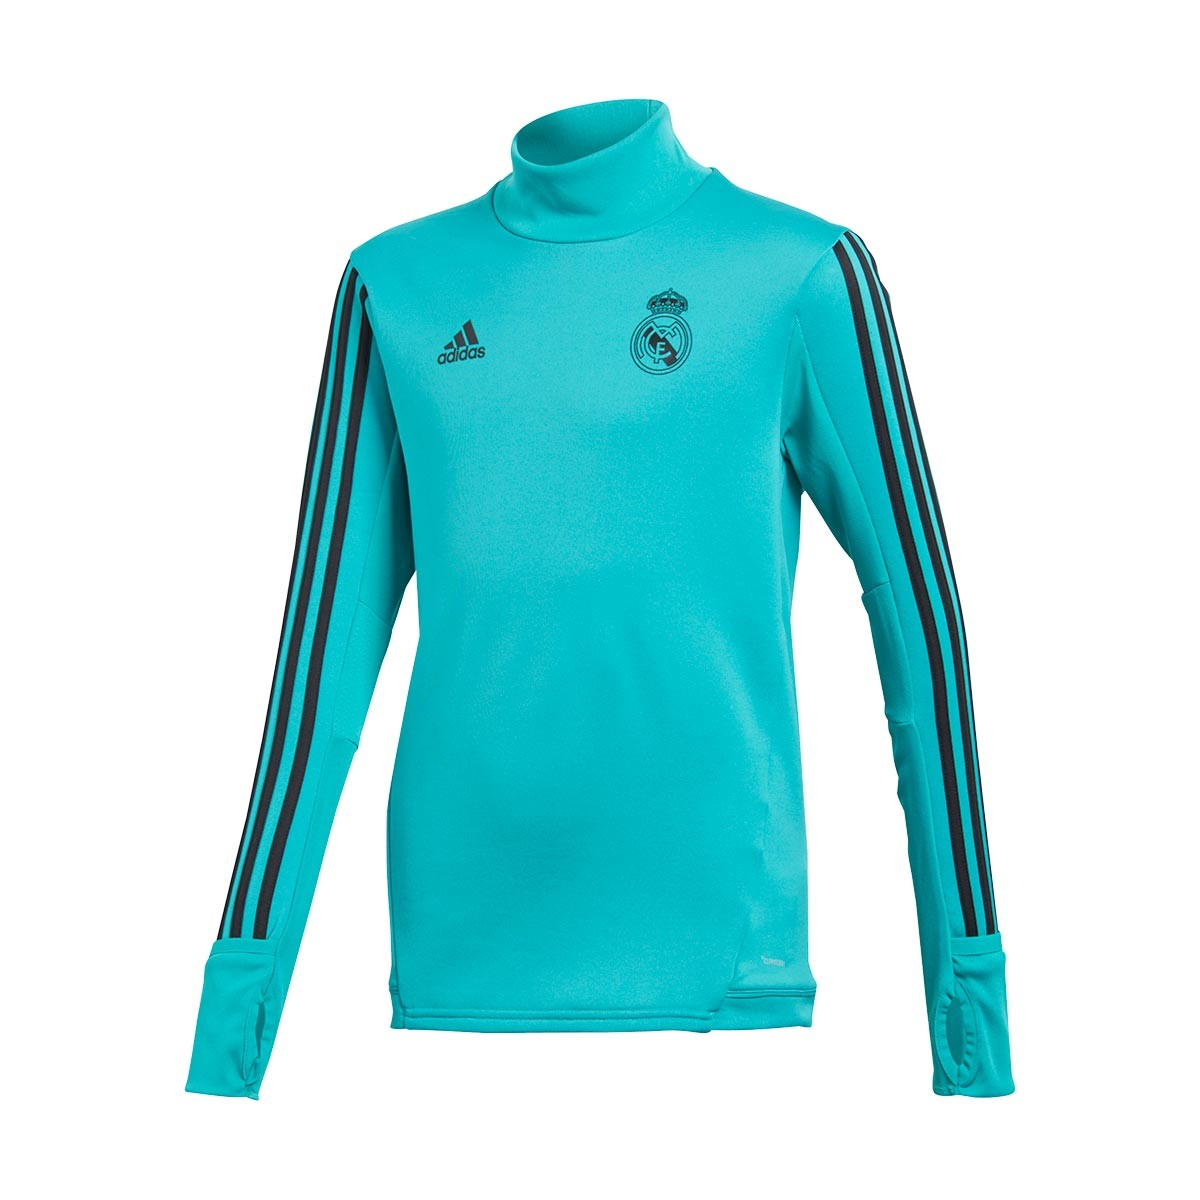 6ae7e0fa07 Sudadera adidas Real Madrid Training Top 2017-2018 Niño Aero reef-Black -  Soloporteros es ahora Fútbol Emotion